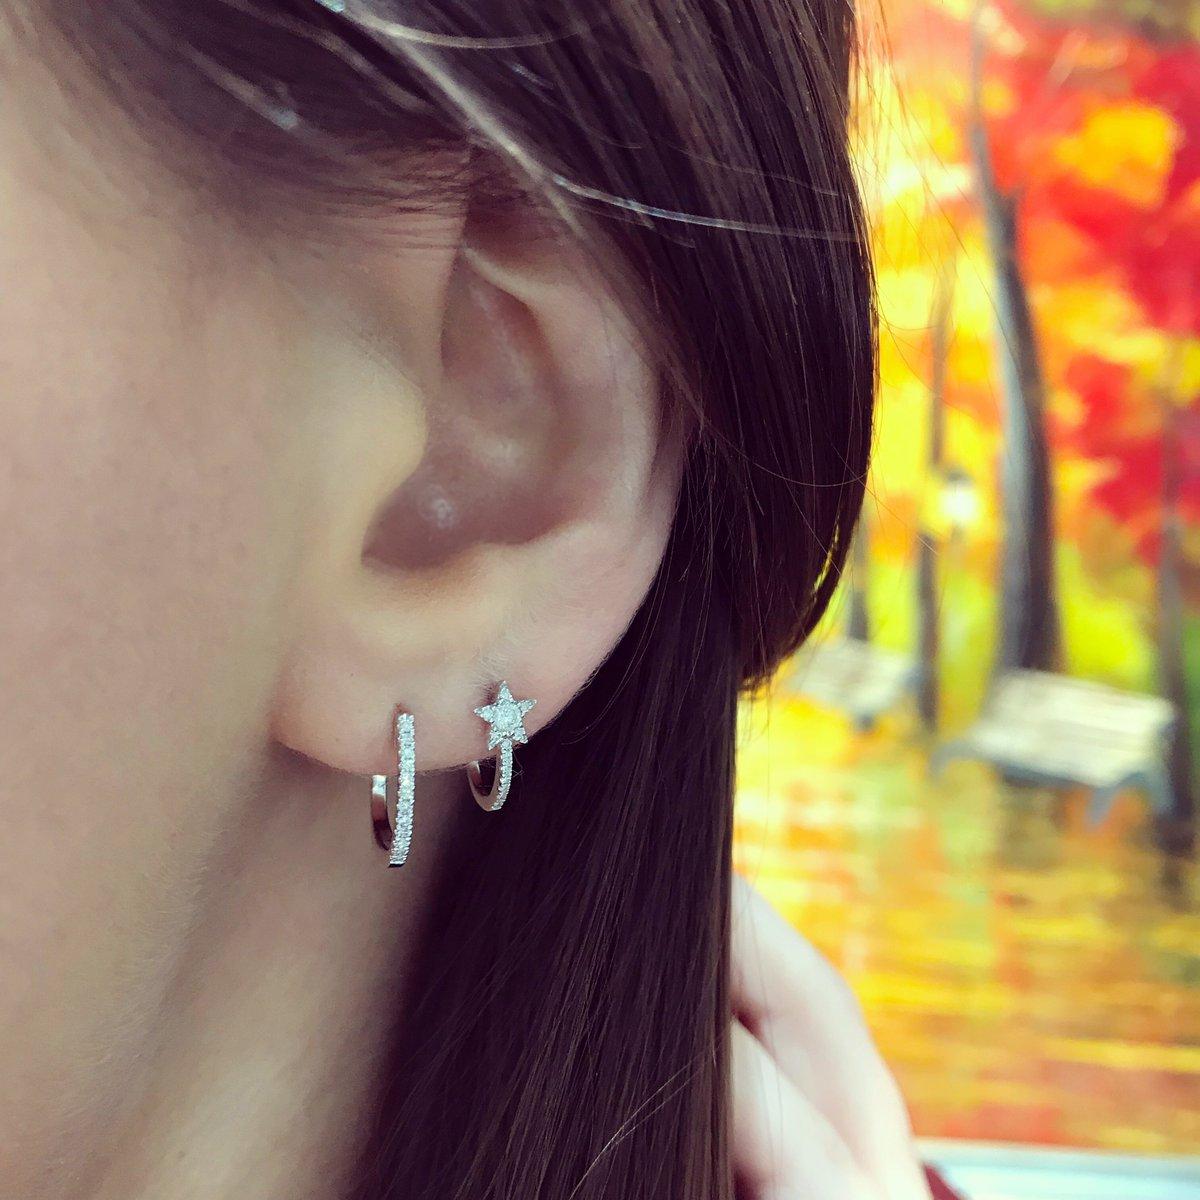 a12ad6b39 #diamonds #wish #jewelry #LOVE #huggiehoops #earrings #fashion  #stylepic.twitter.com/5pTyRmoBZE